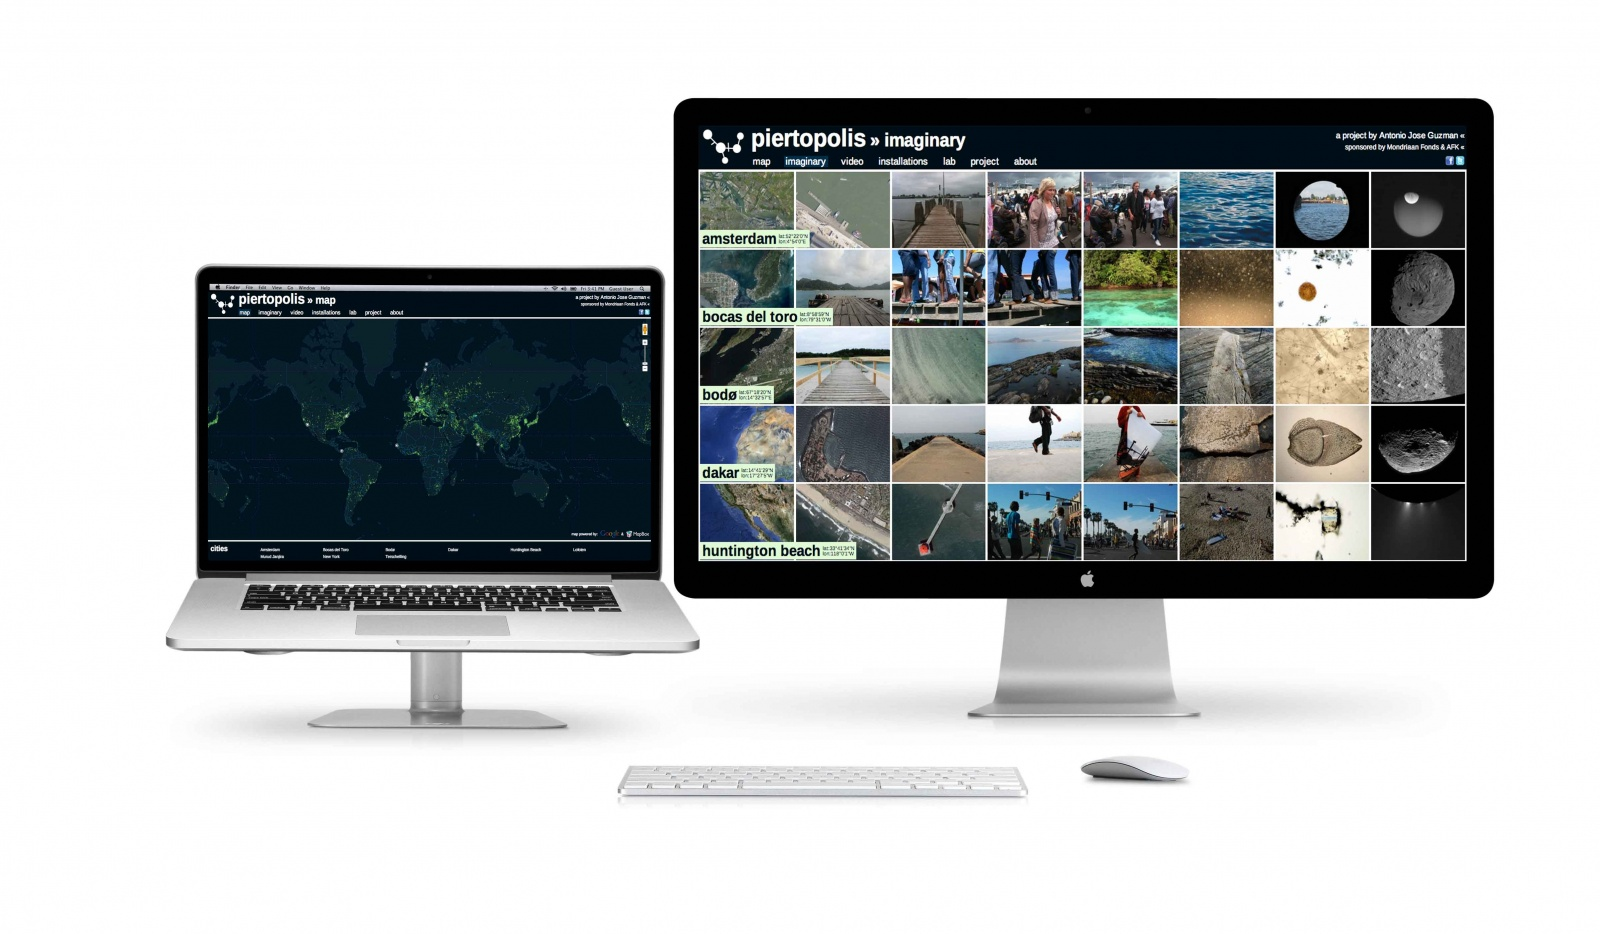 piertopolis-MacBook